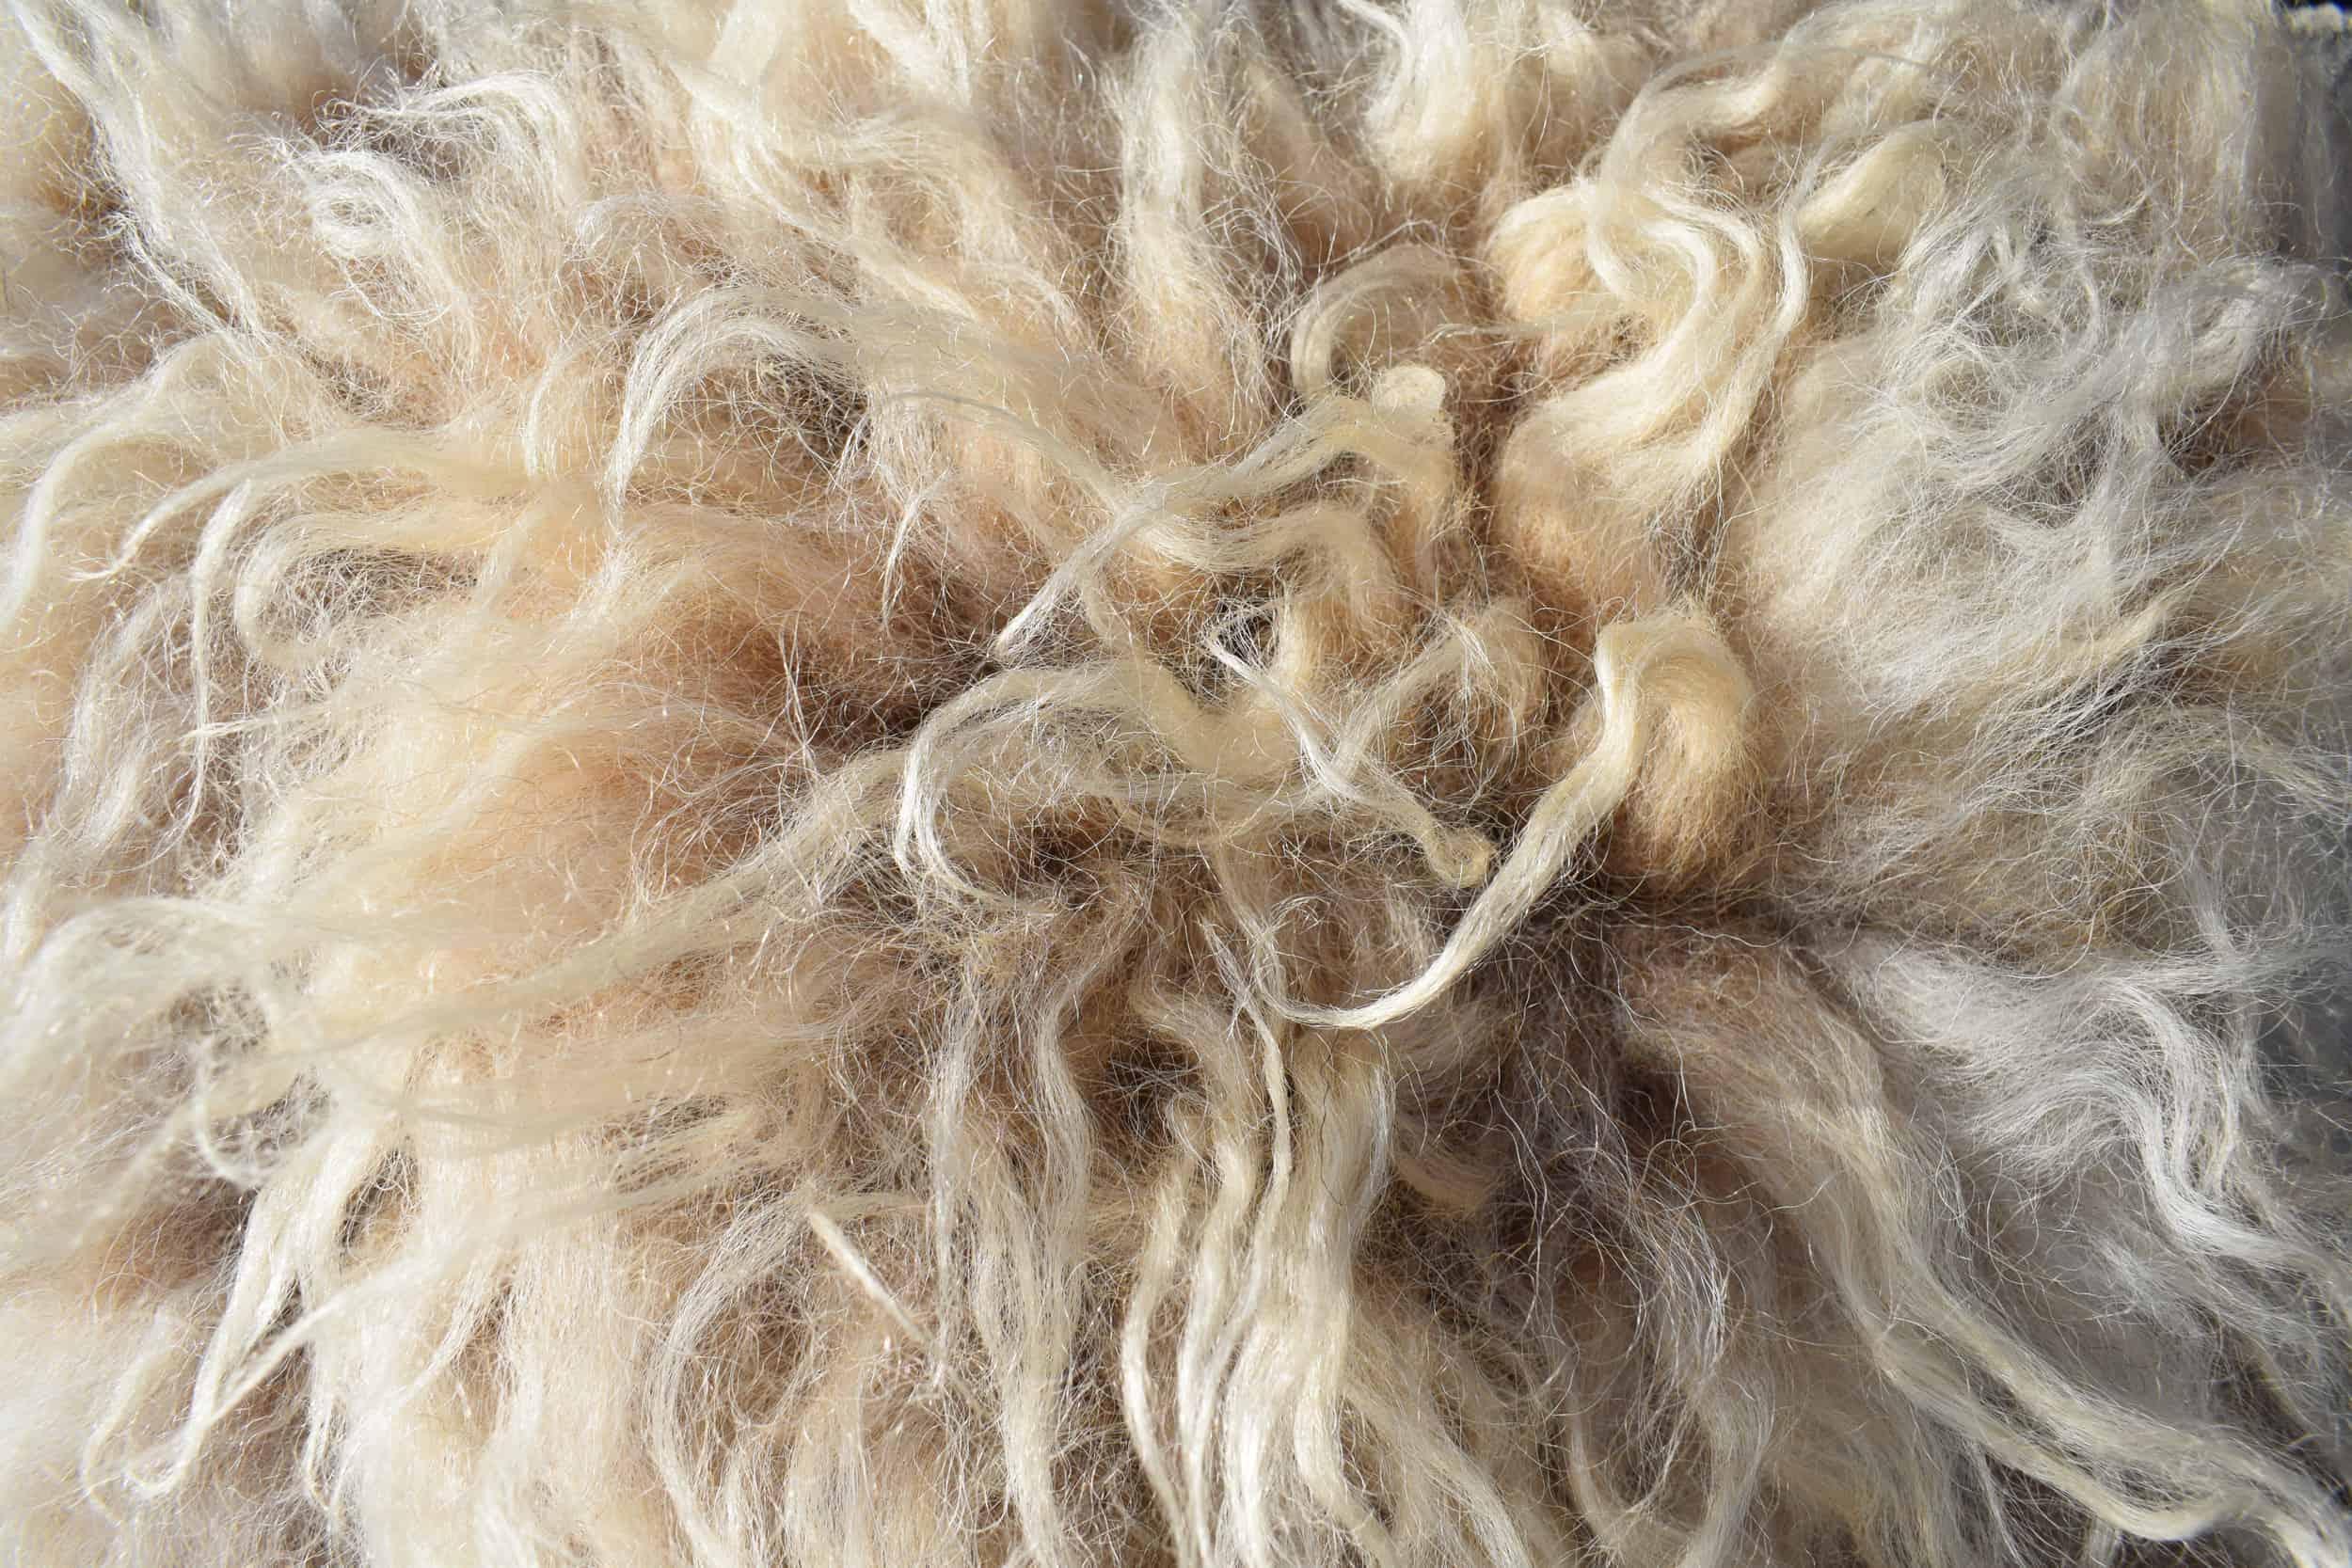 felted fleece wool sheepskinpegloom woven wool cushion handmade moorit grey brown natural wool patchwork sheep